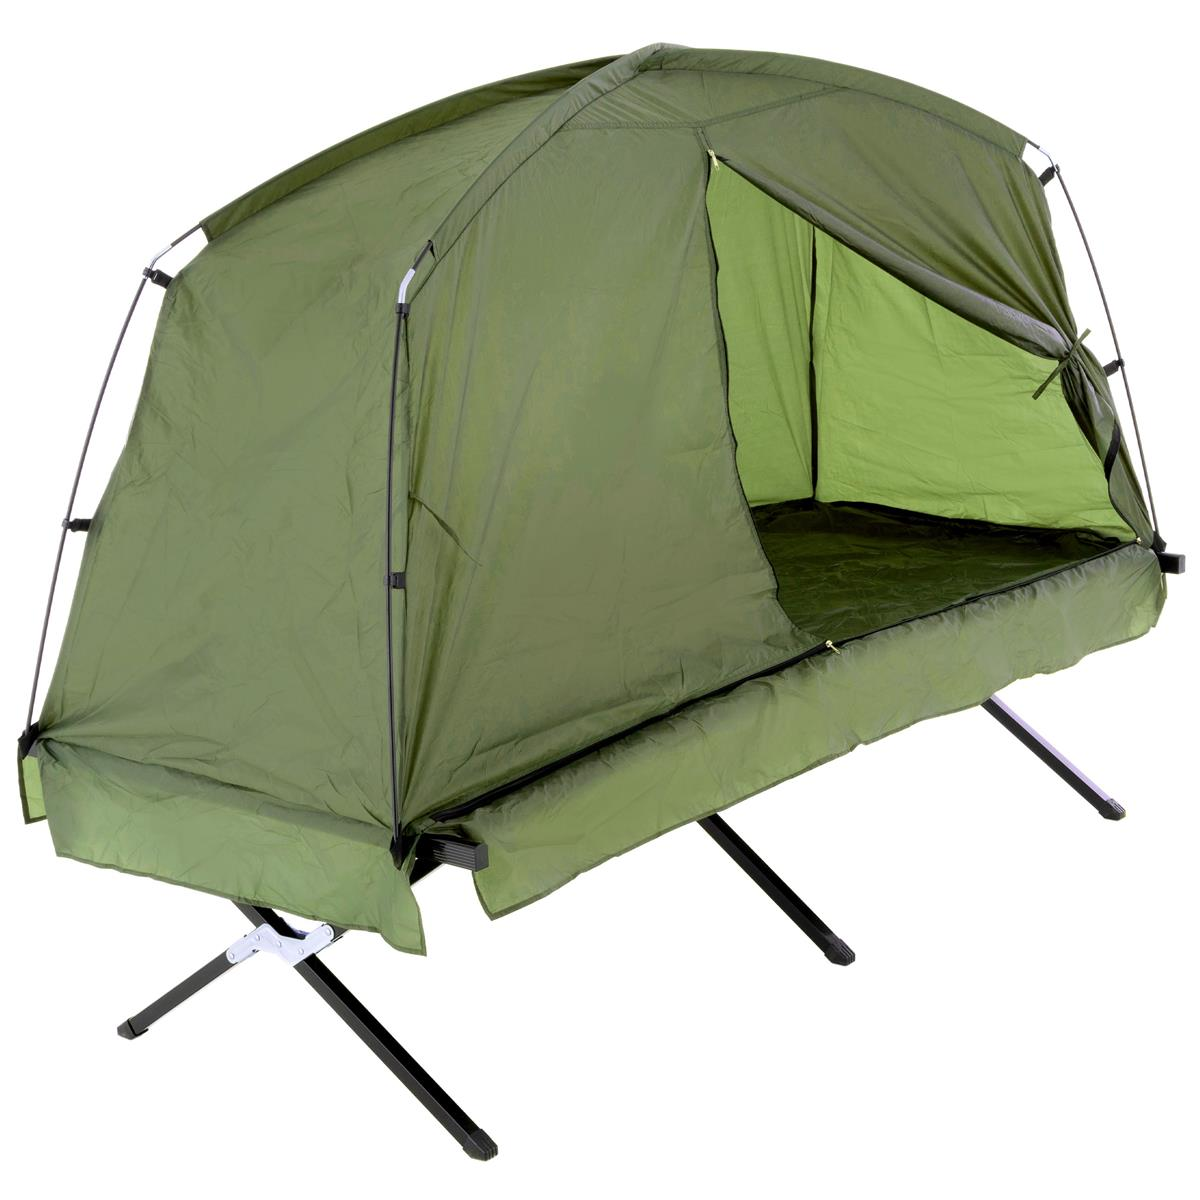 Survival-Zelt Feldbett mit Zelt185x76x154 cm grün Angelzelt Campingliege Angeln